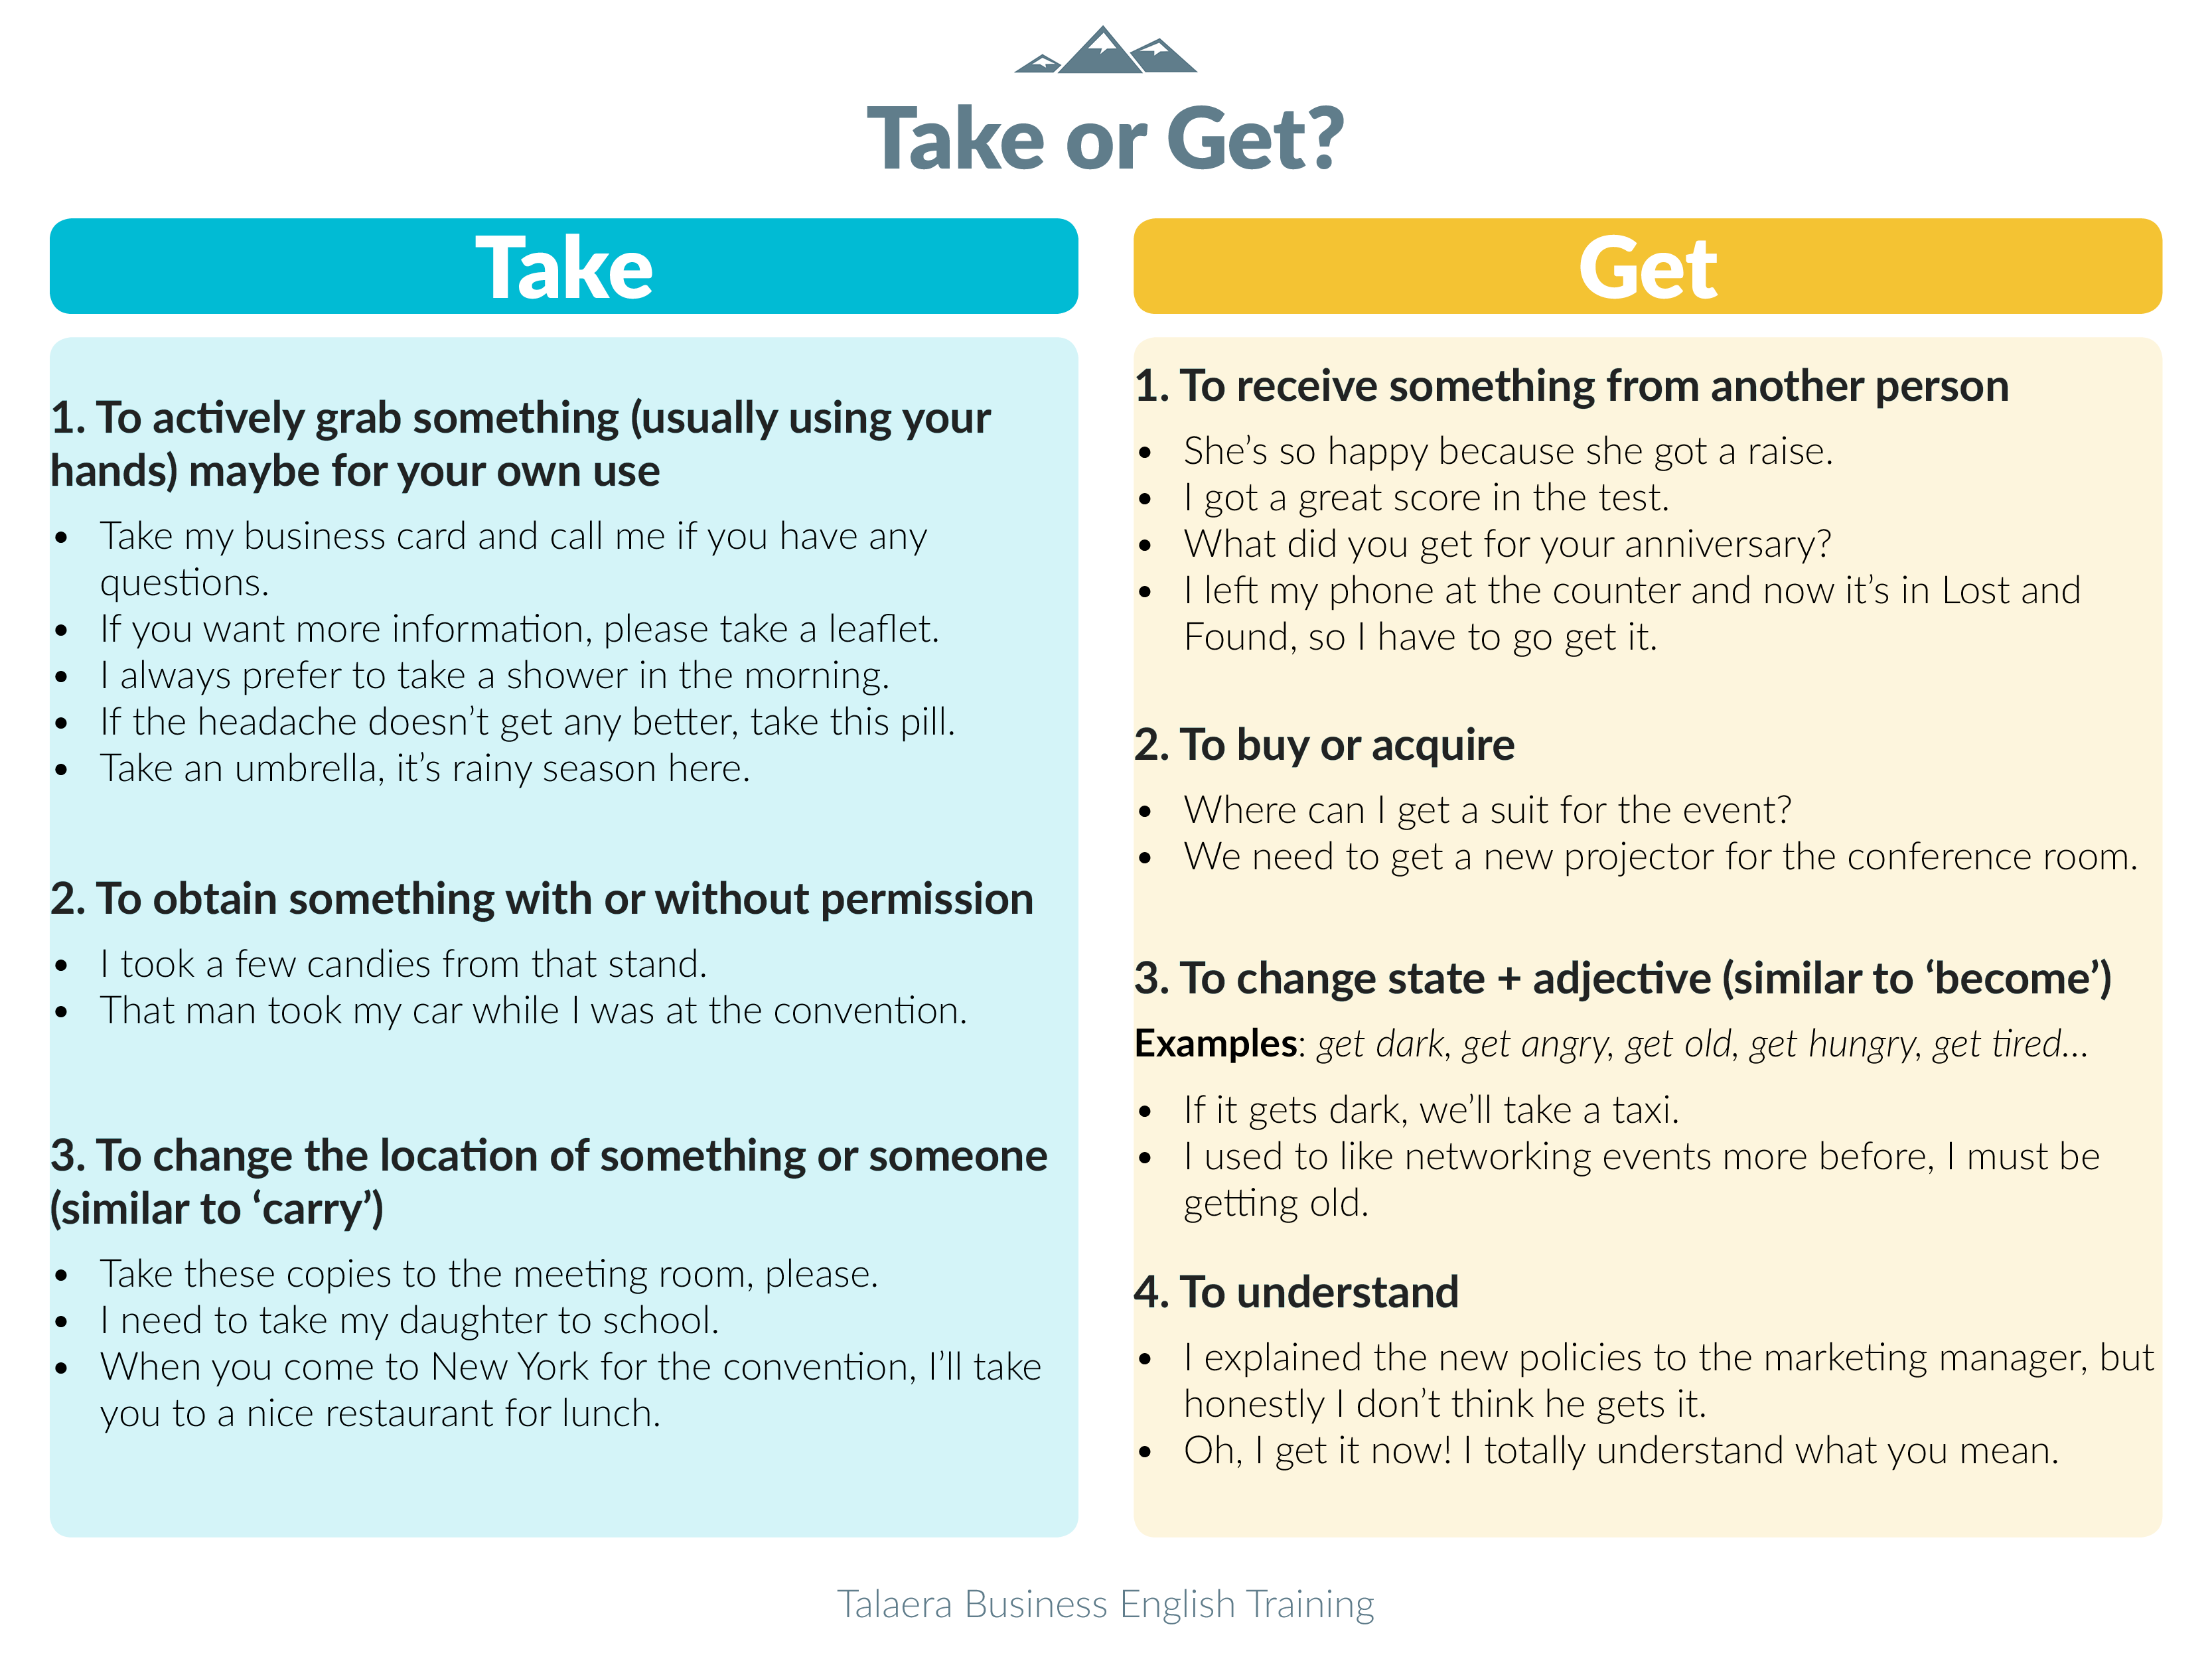 take vs get examples Talaera